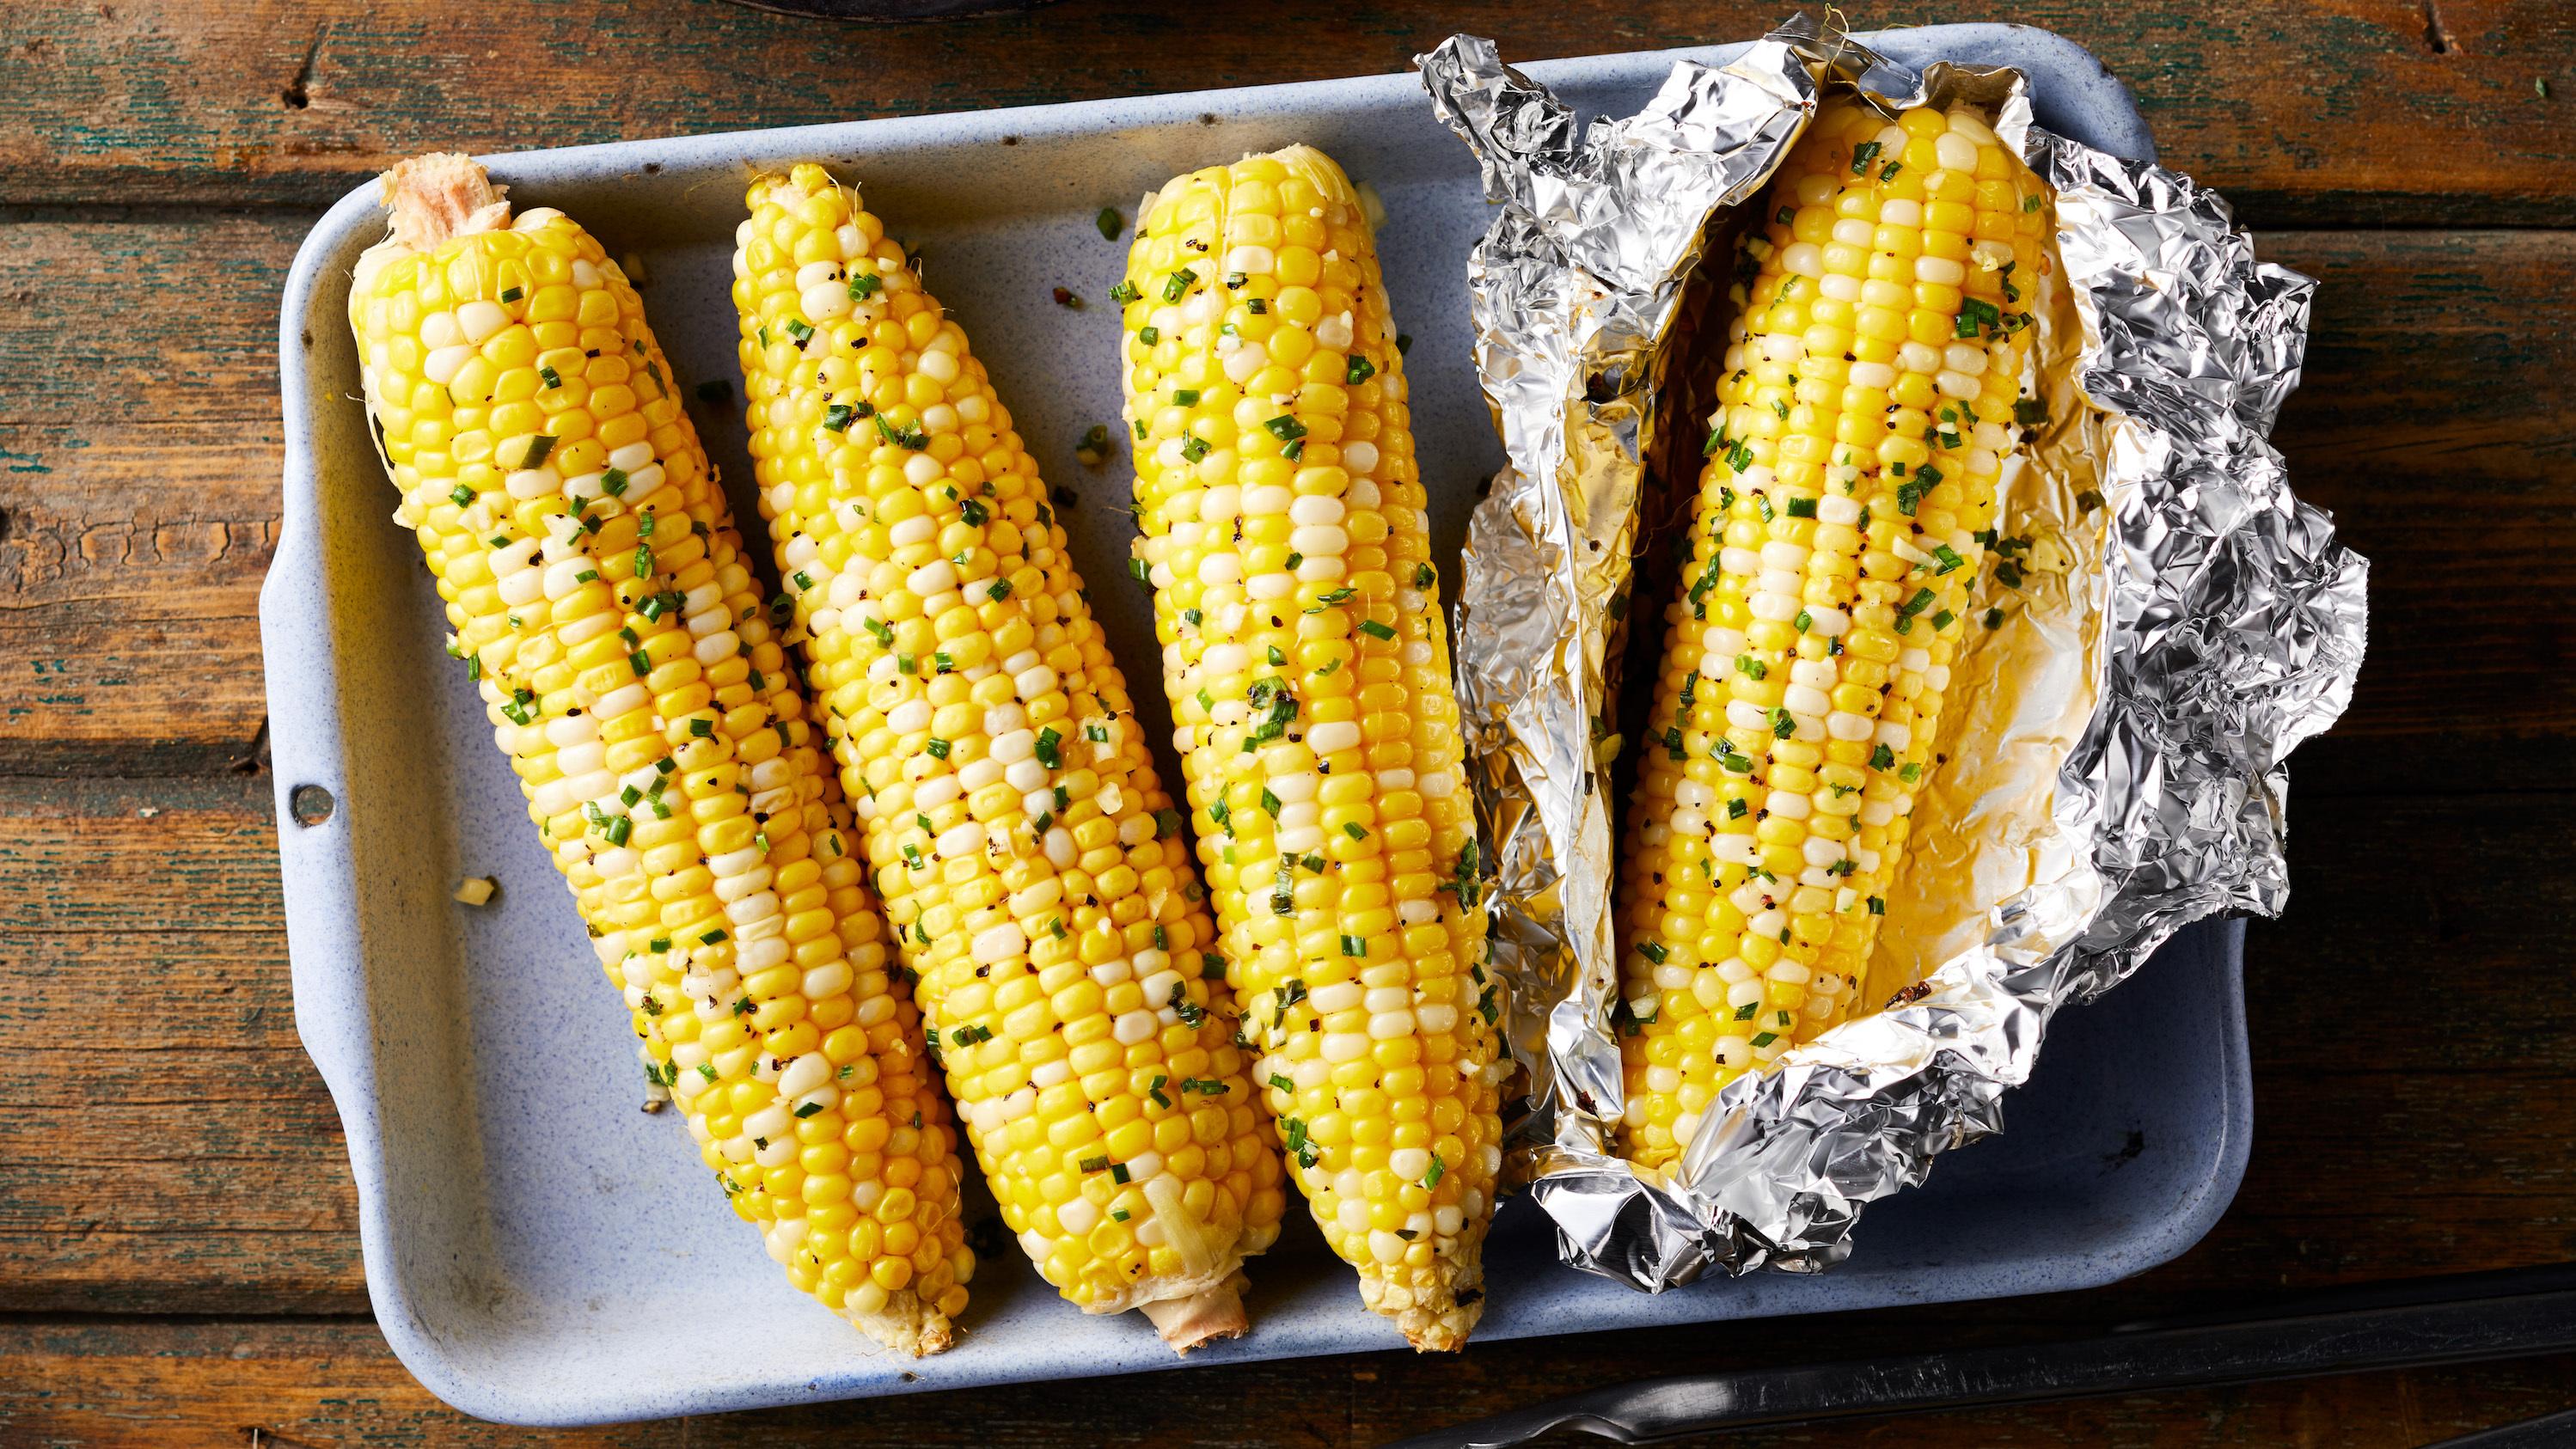 Garlic Butter Campfire Corn Trusted Brands